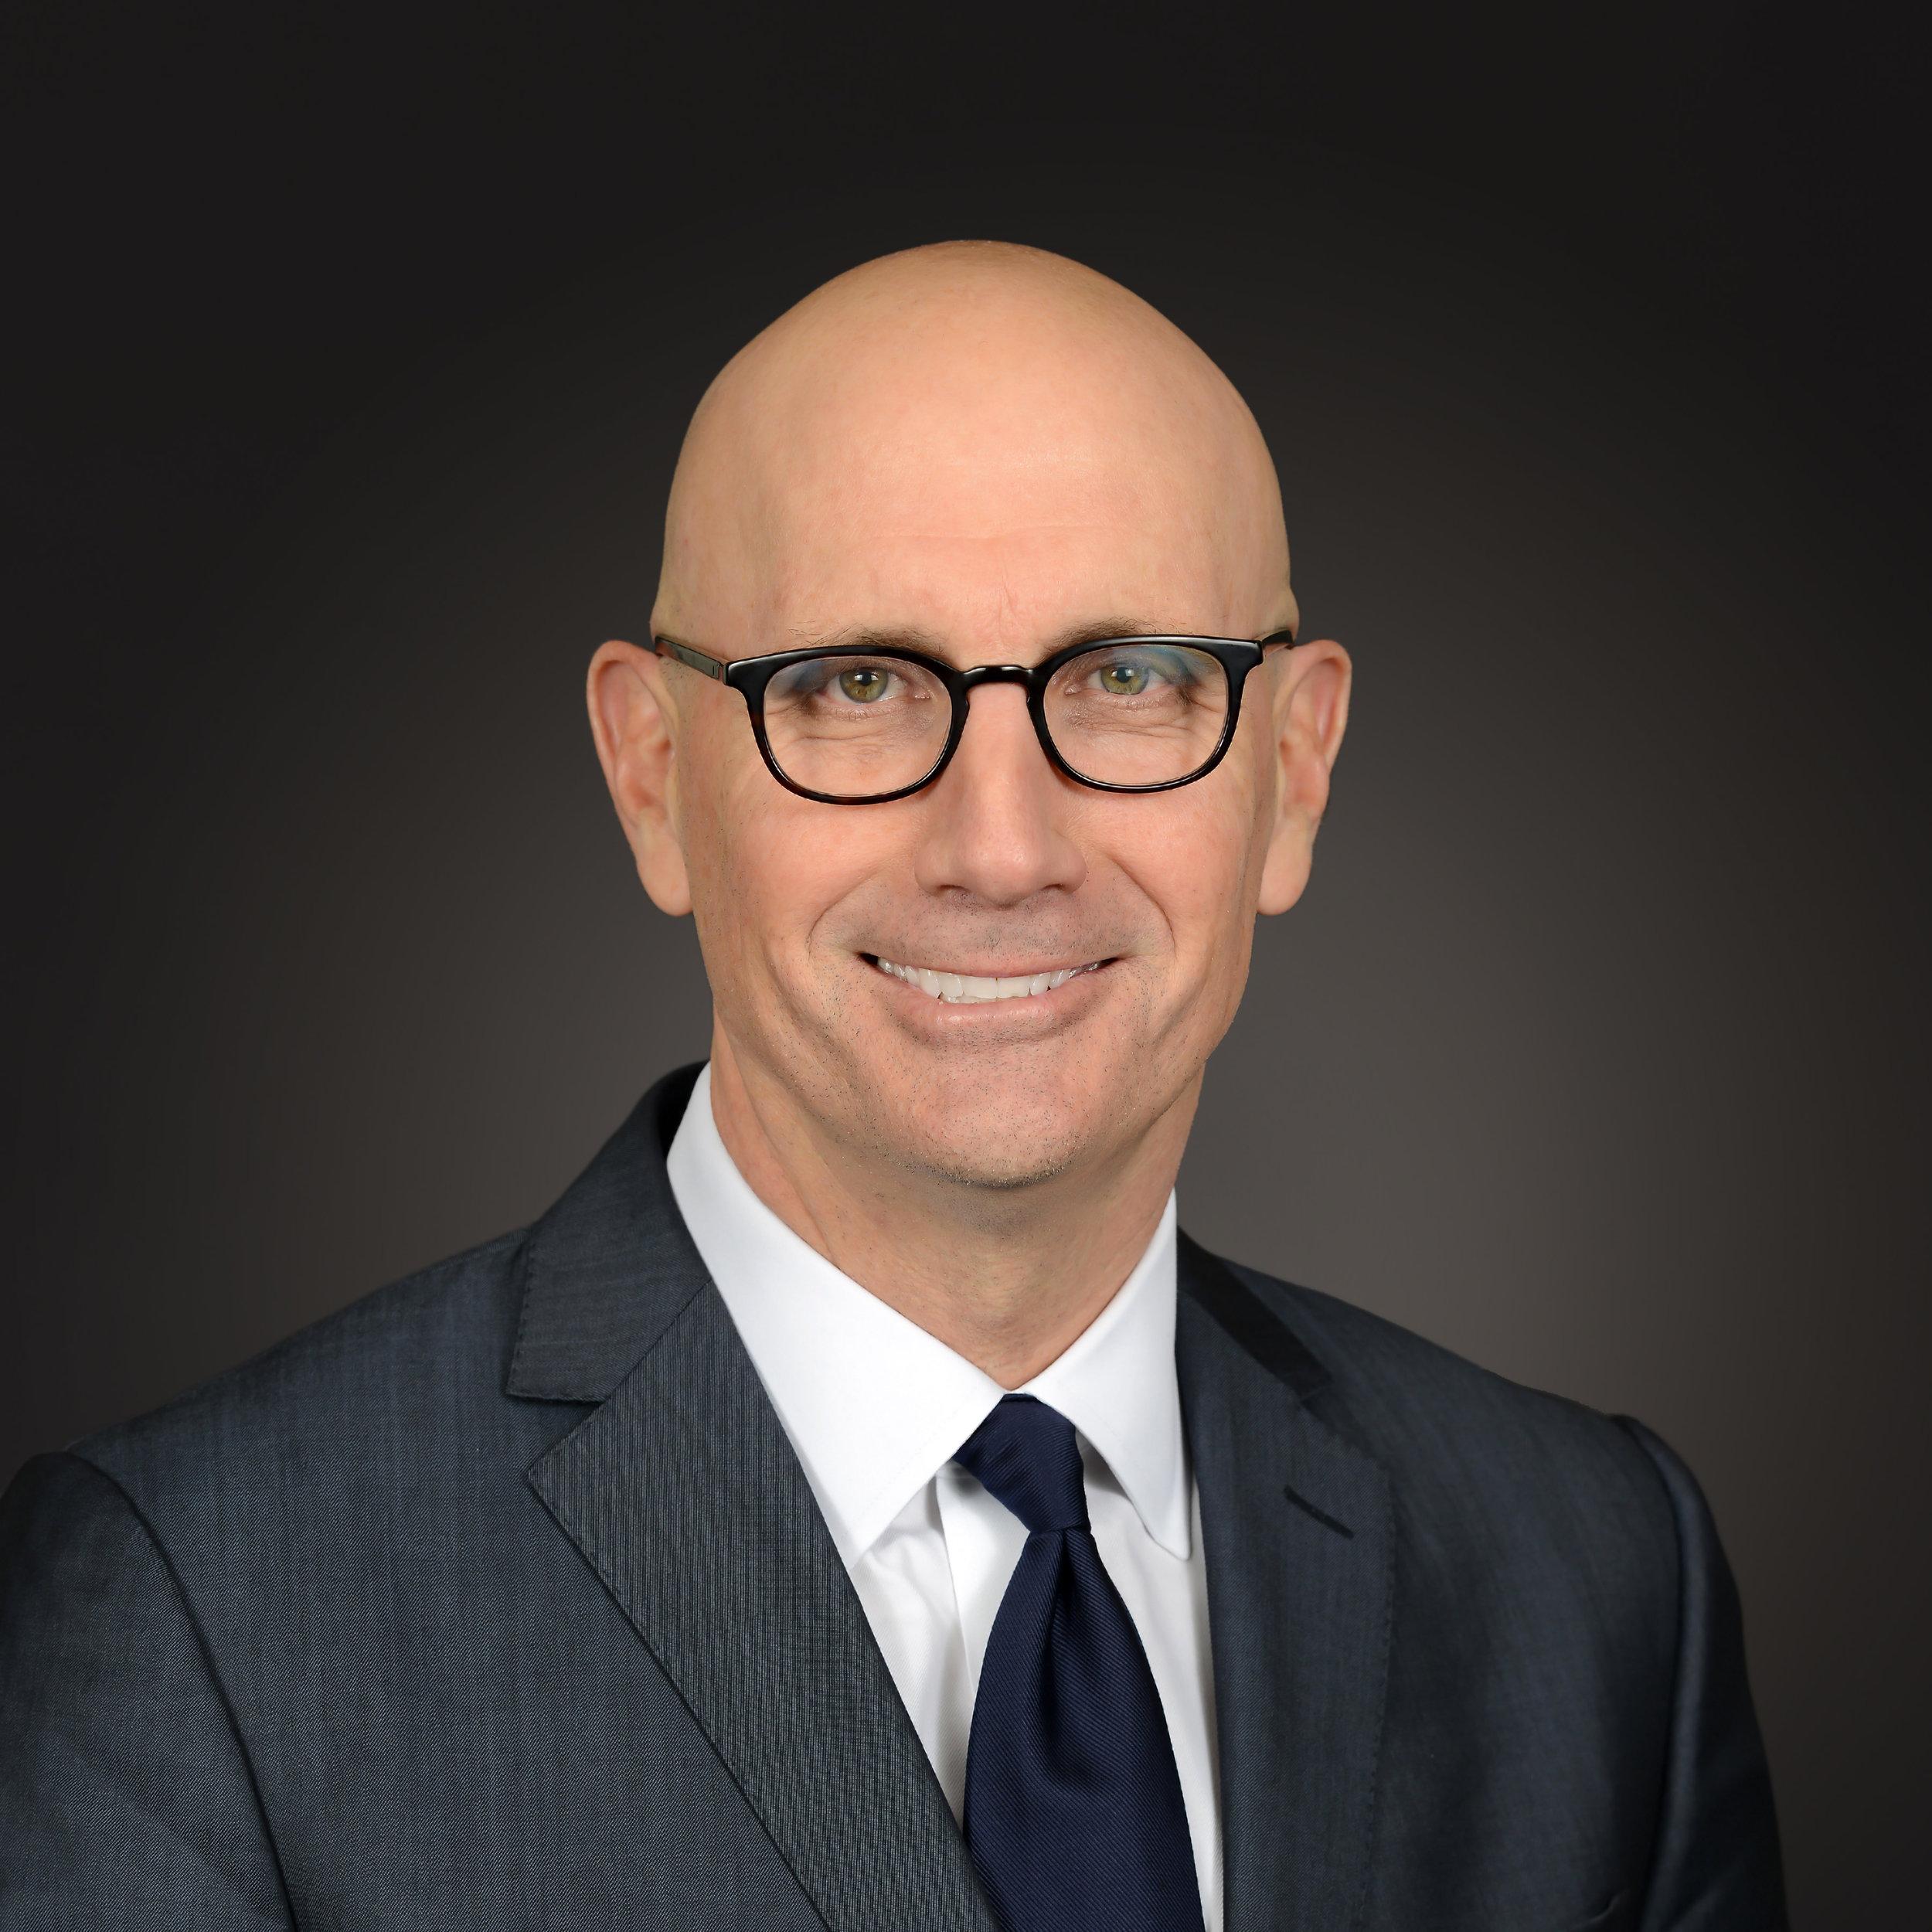 Scott Morey - Executive Director